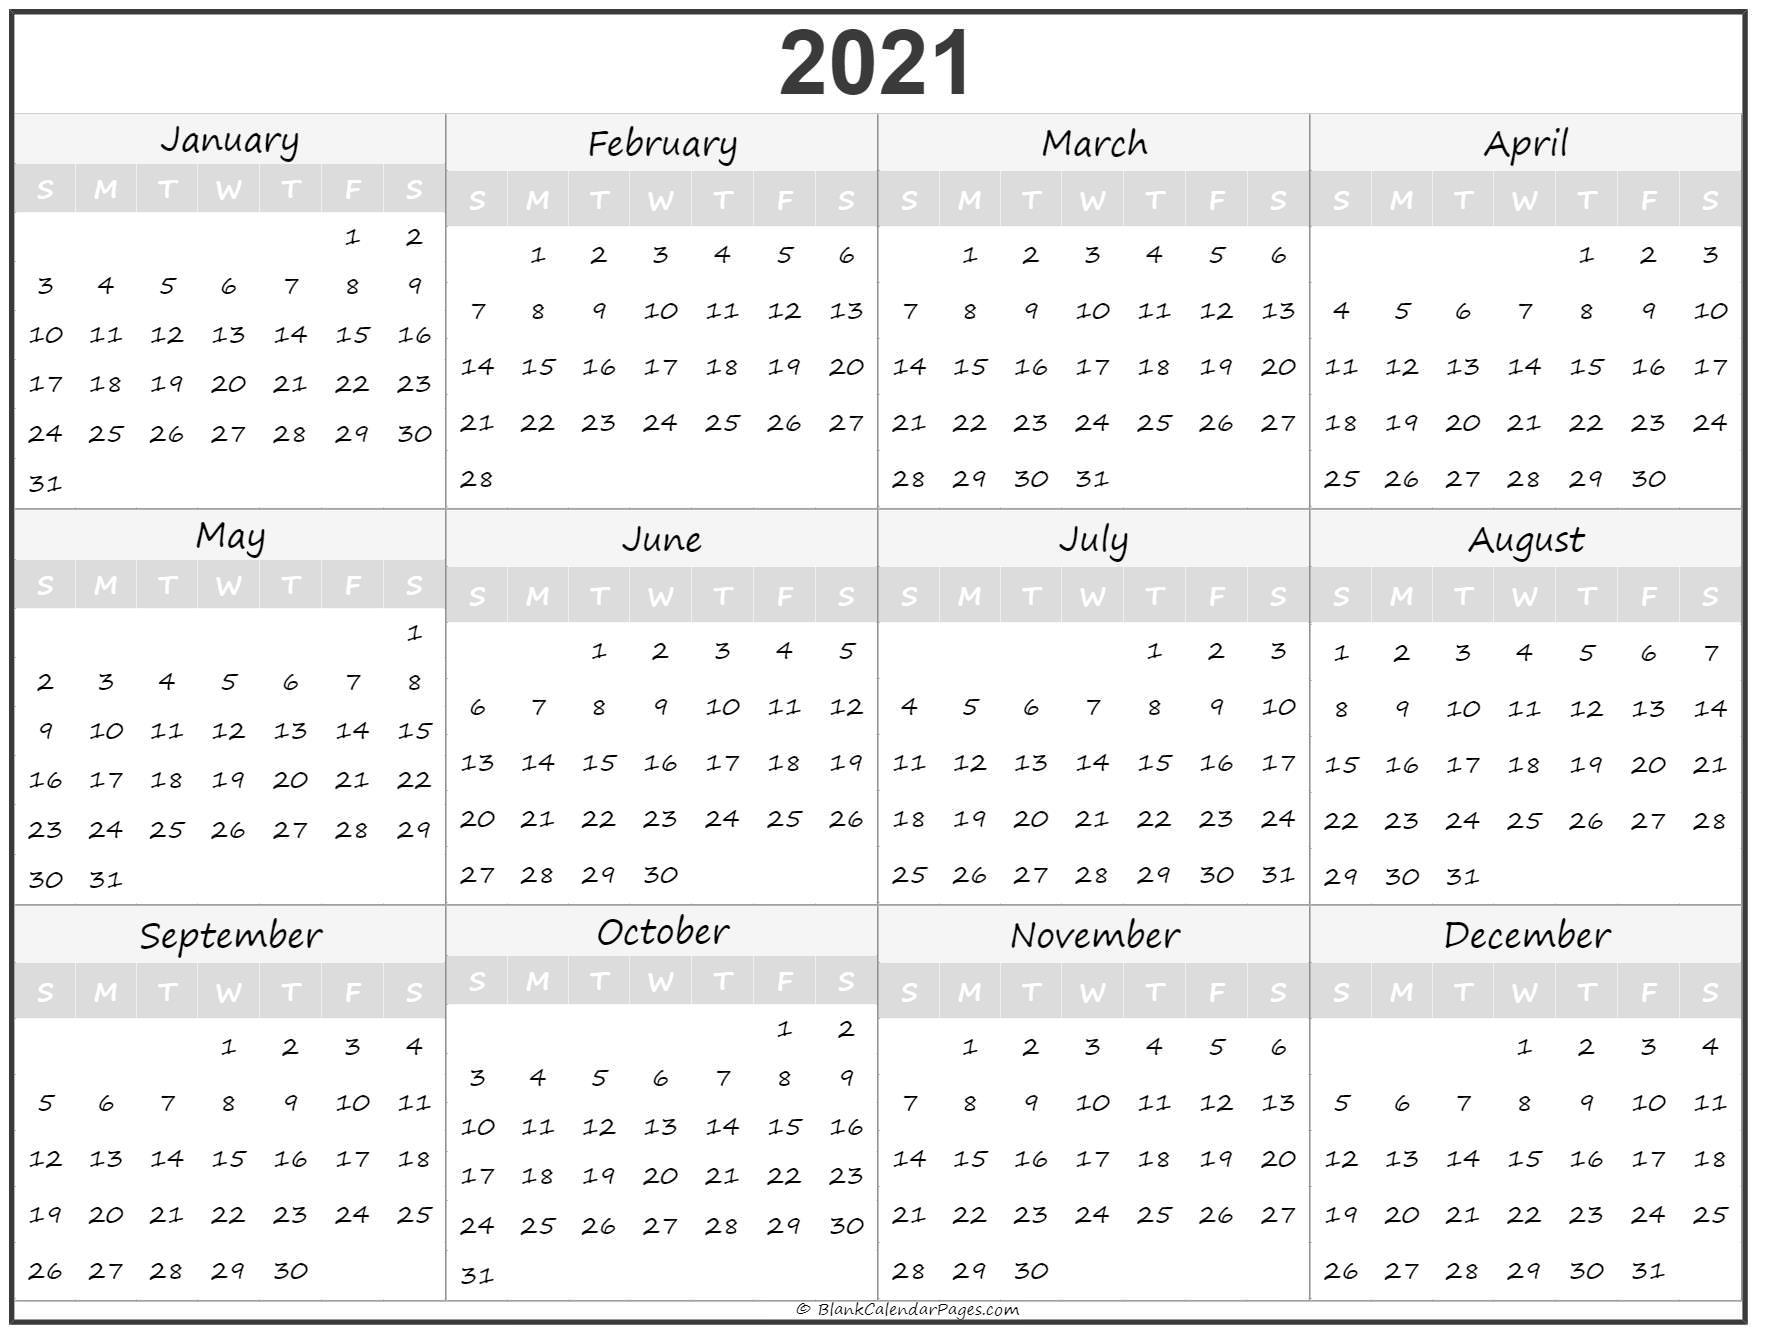 2021 year calendar printout